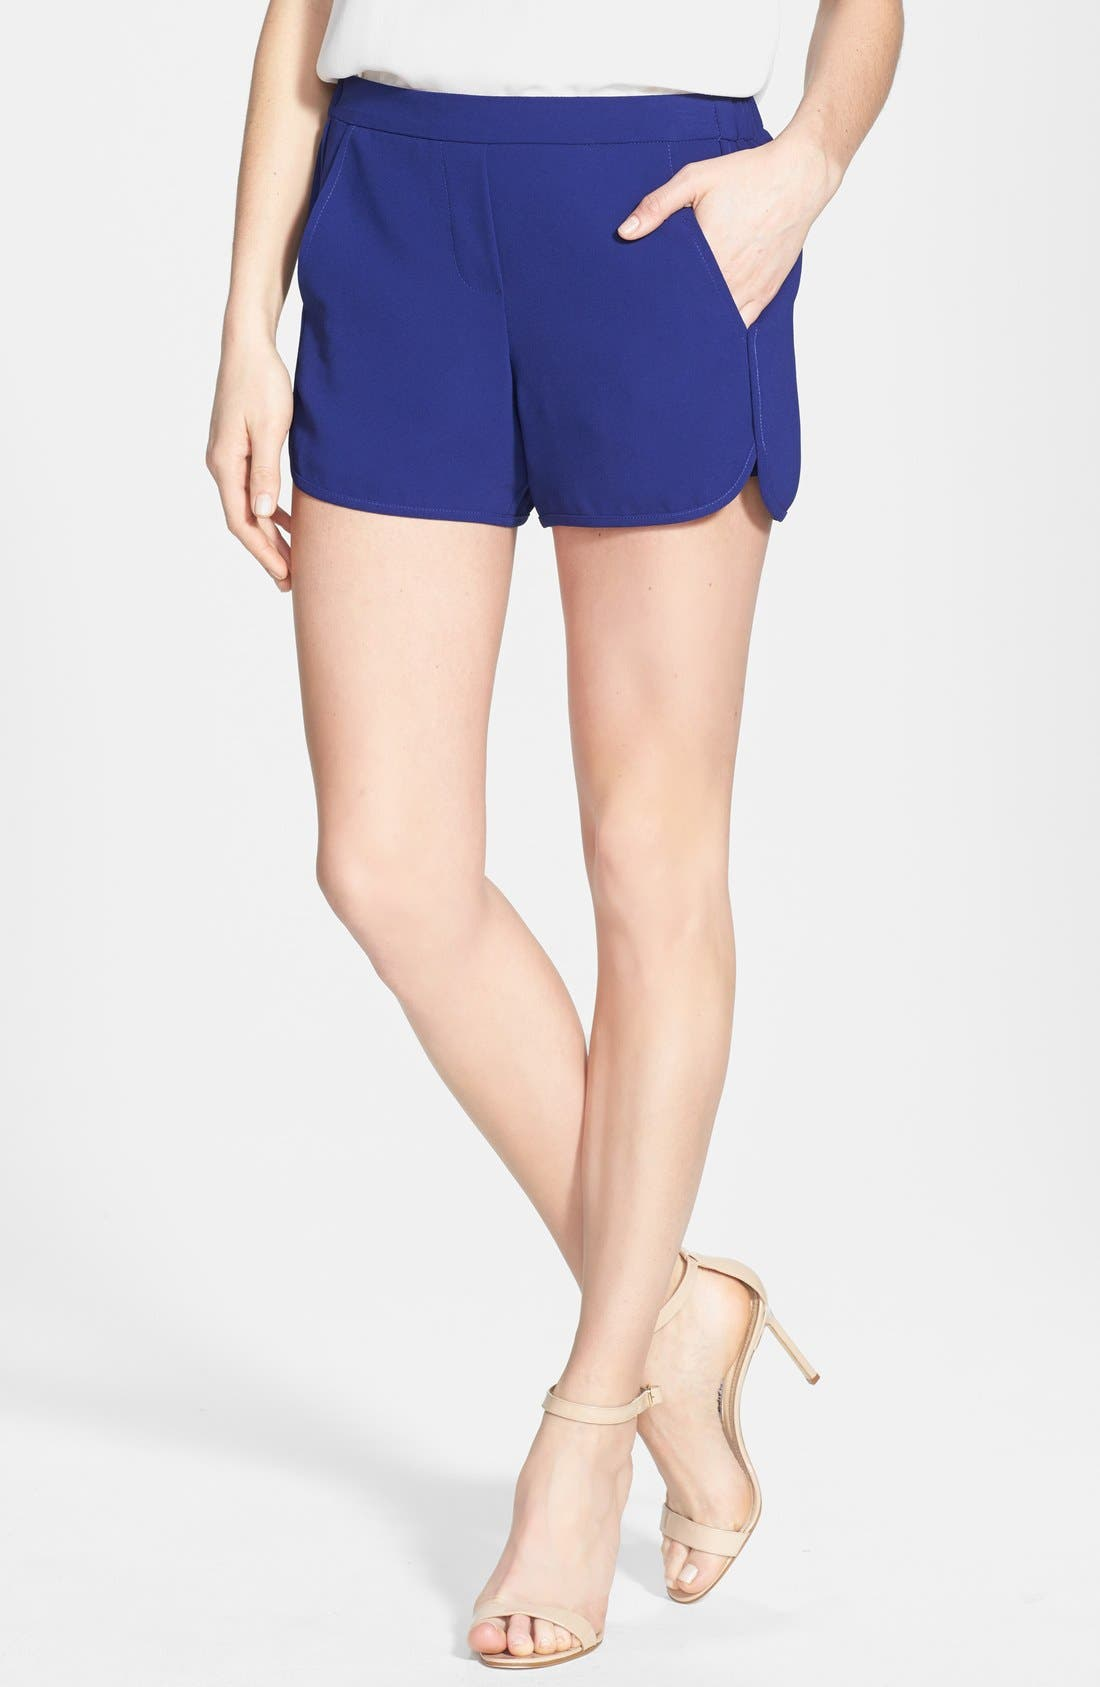 Alternate Image 1 Selected - Trina Turk 'Kristoph' Shorts